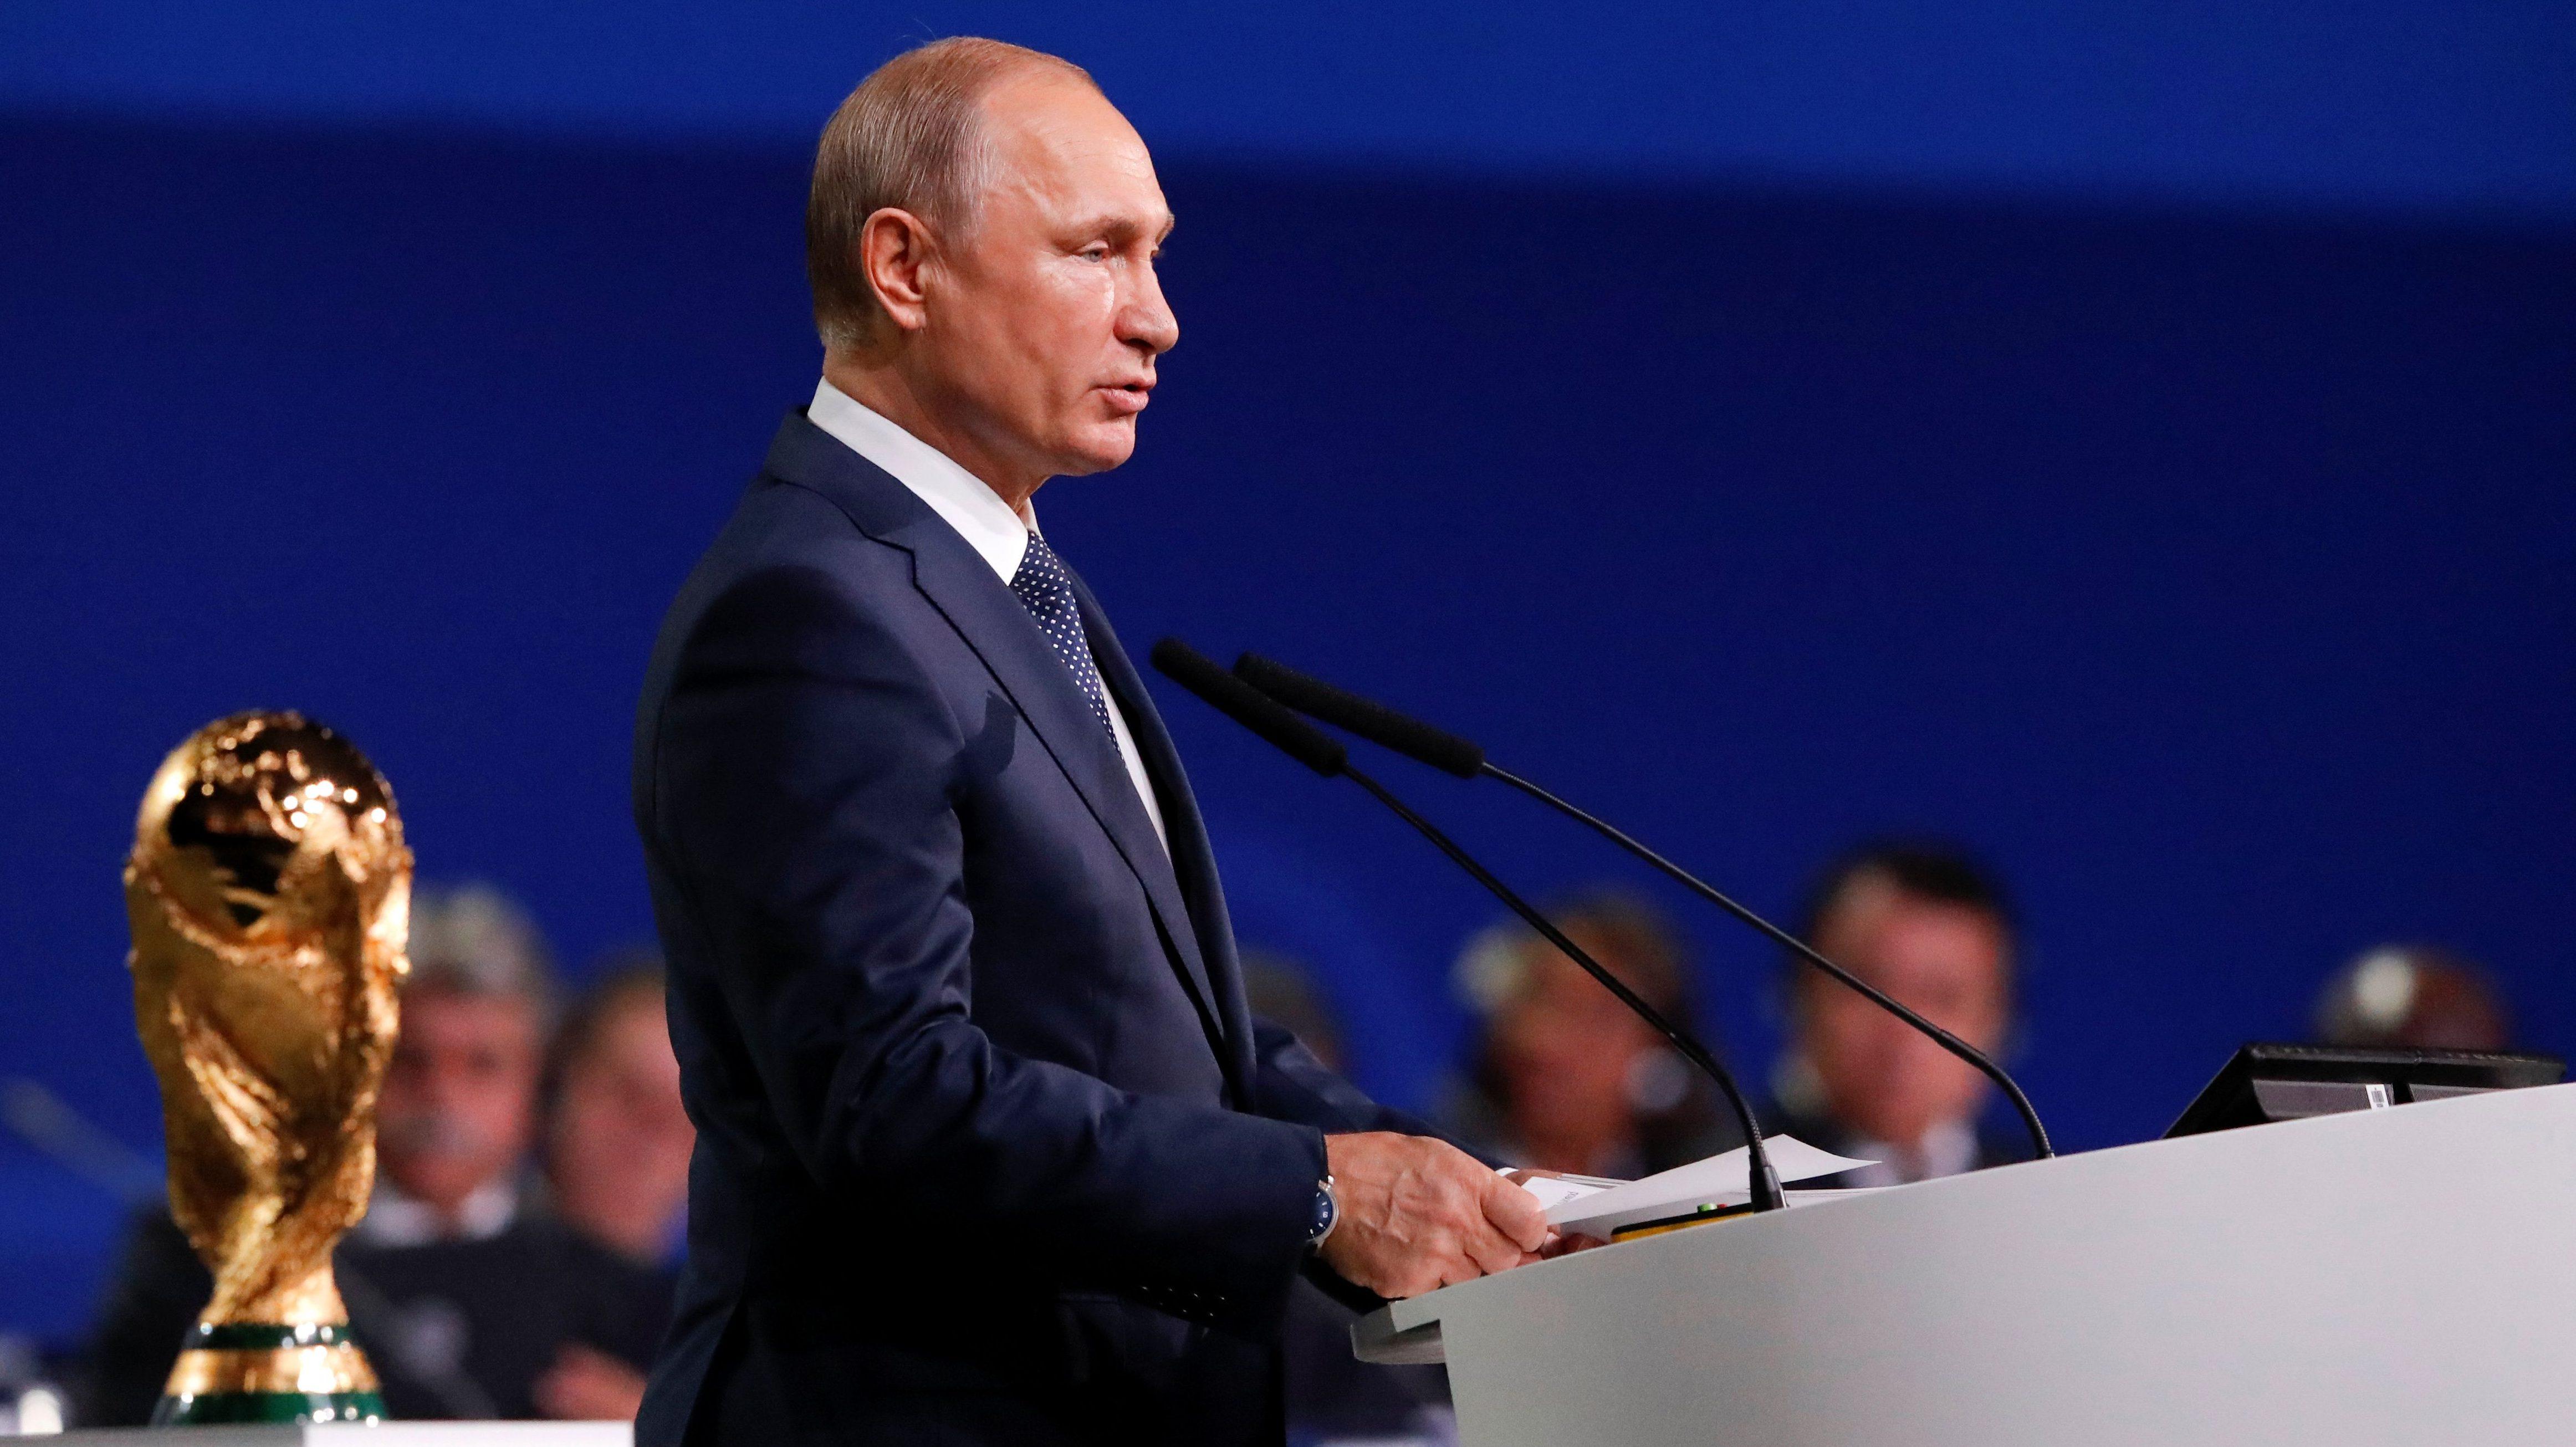 The true winner of the World Cup? Vladimir Putin, of course.